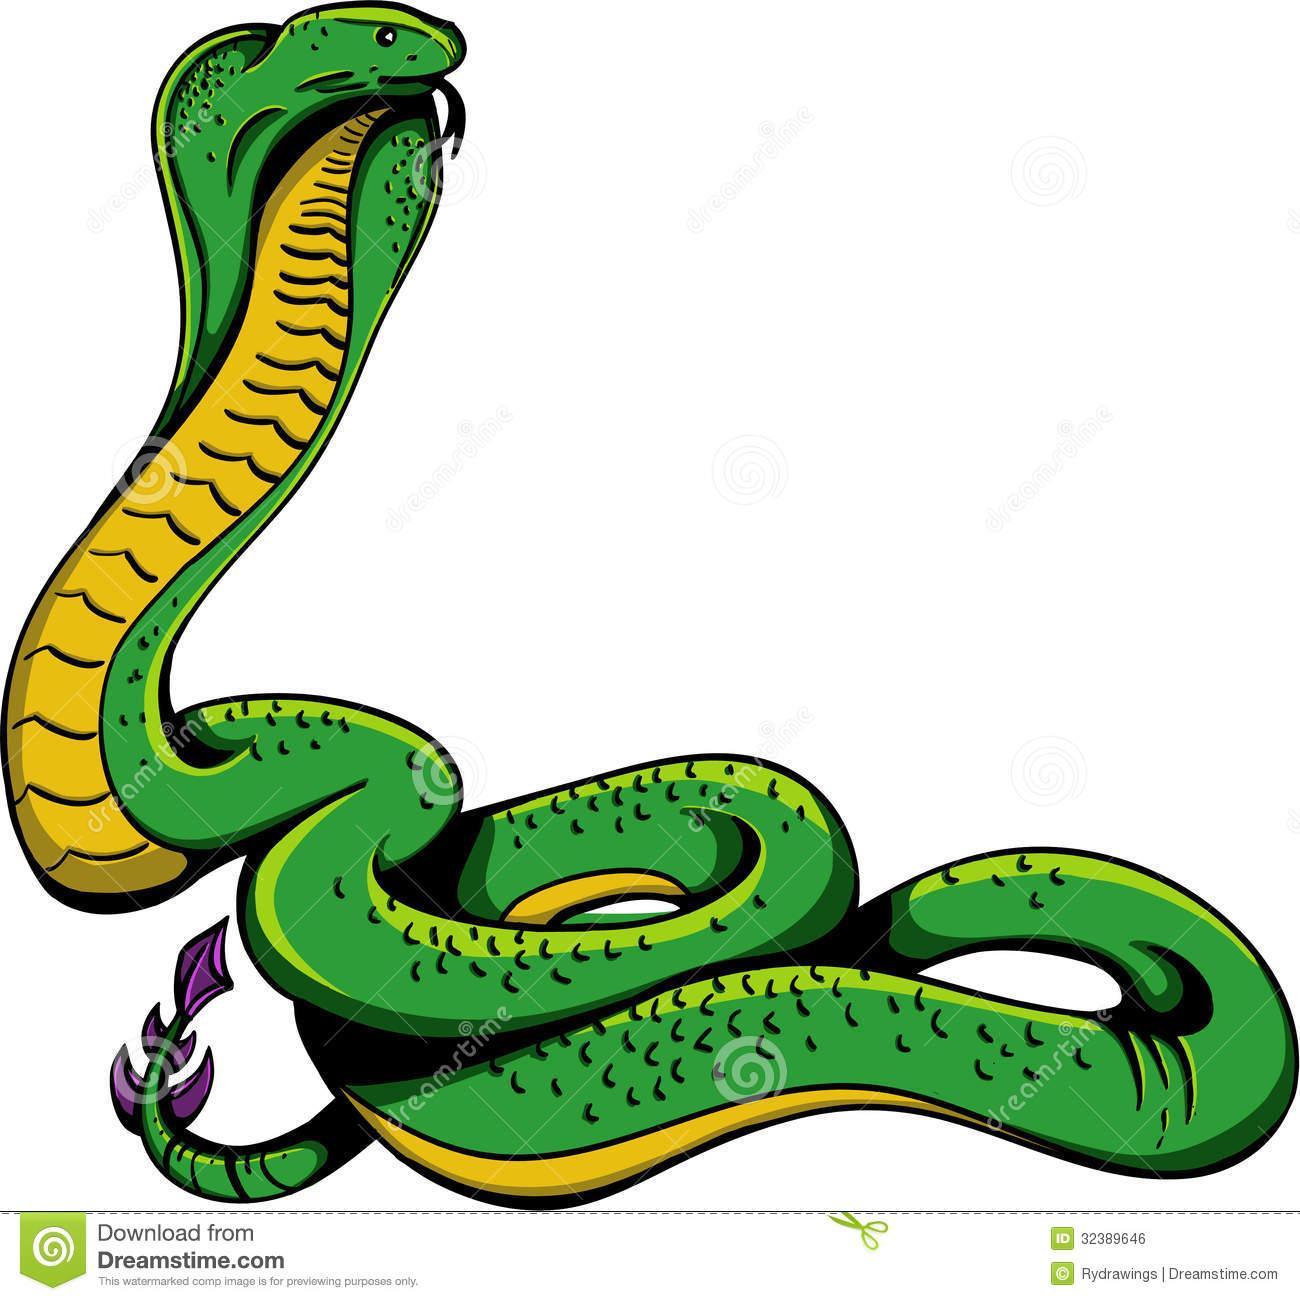 viper snake clipart at getdrawings com free for personal use viper rh getdrawings com viper head clipart viper head clipart